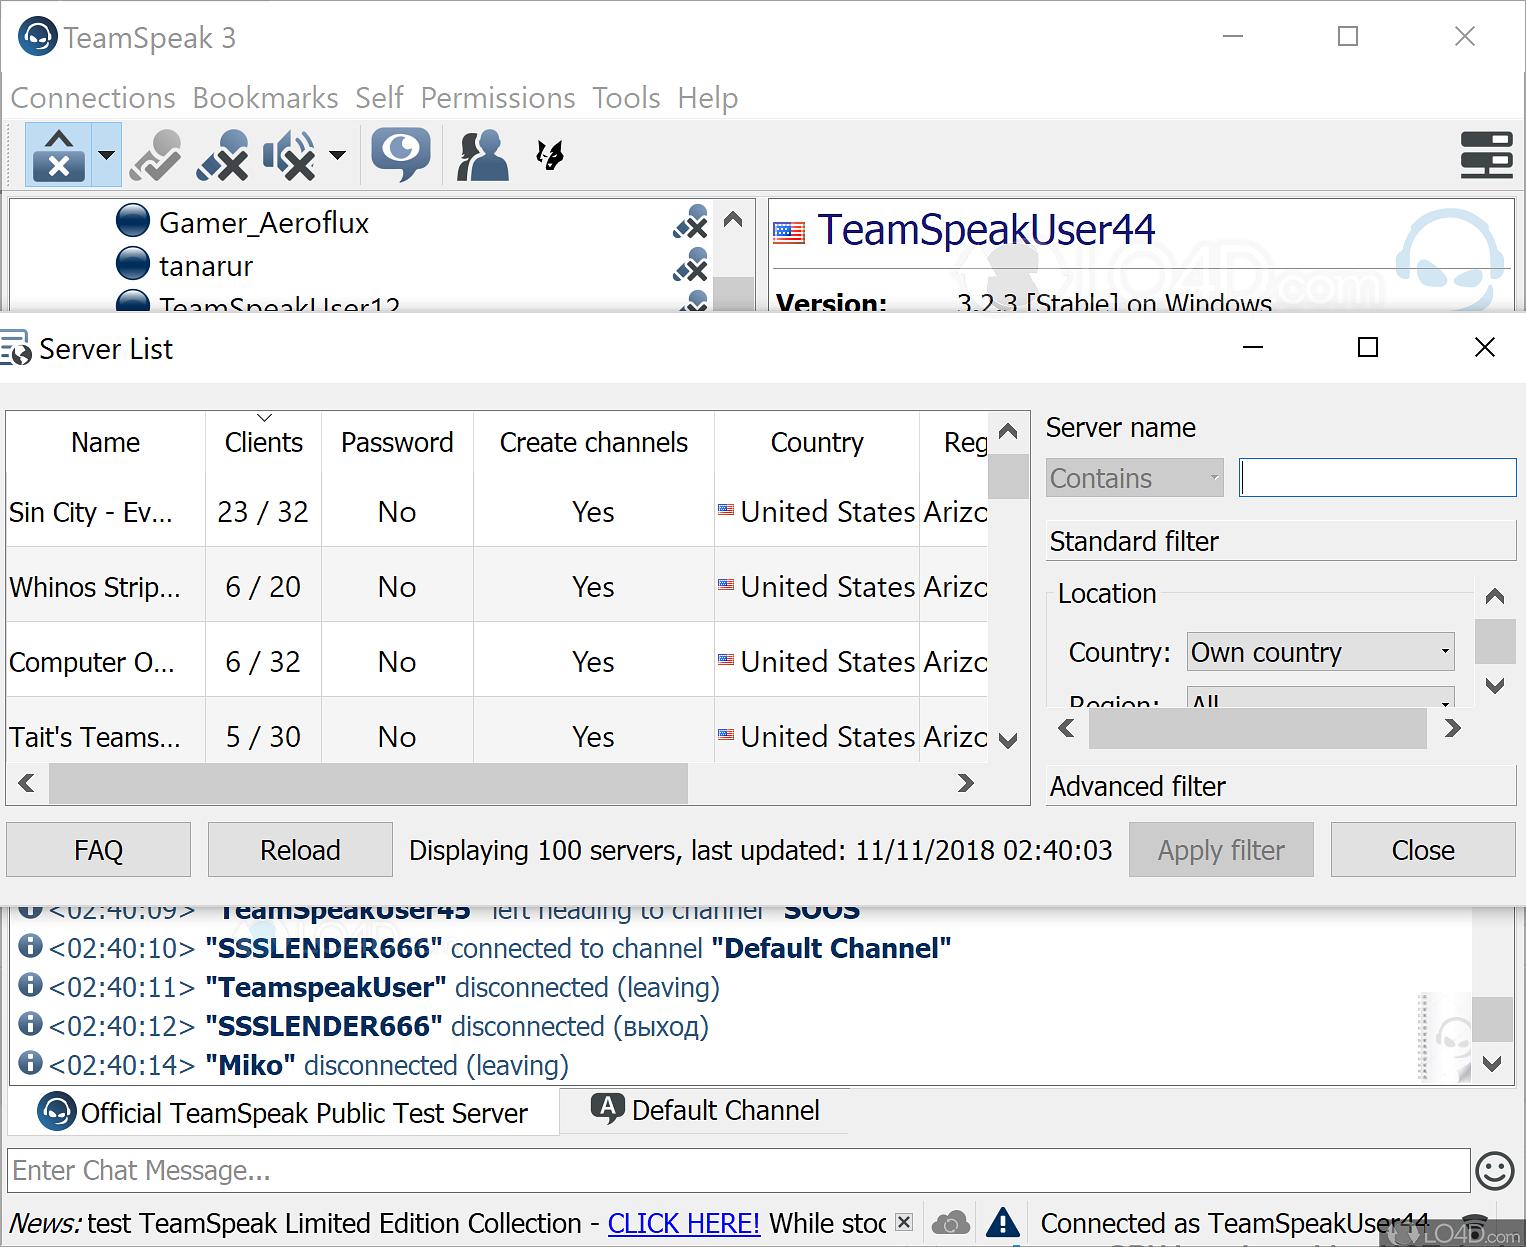 teamspeak 3 download free windows xp 32 bit